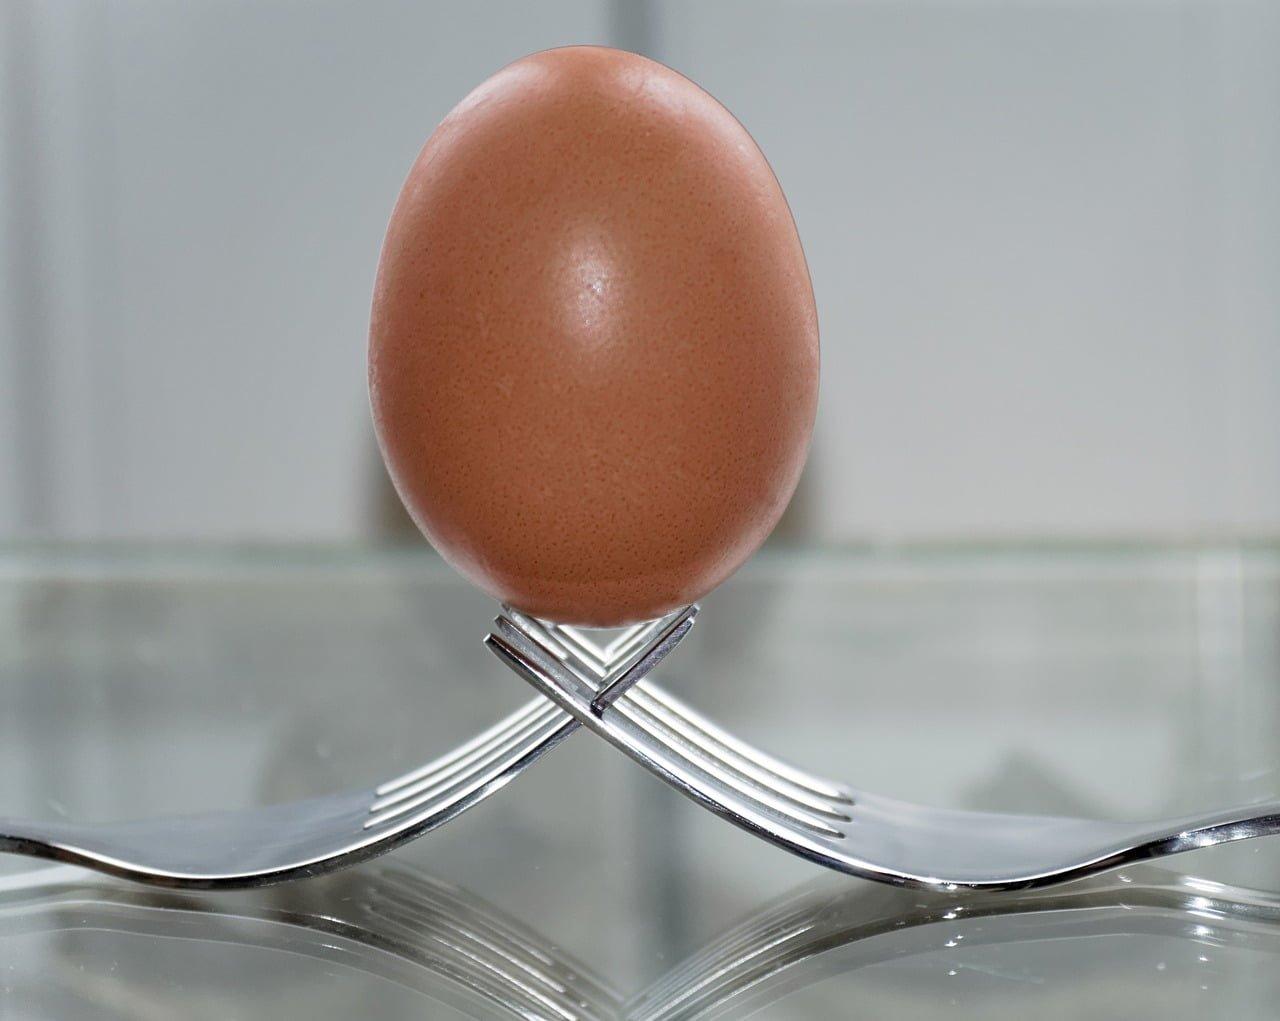 régime œuf